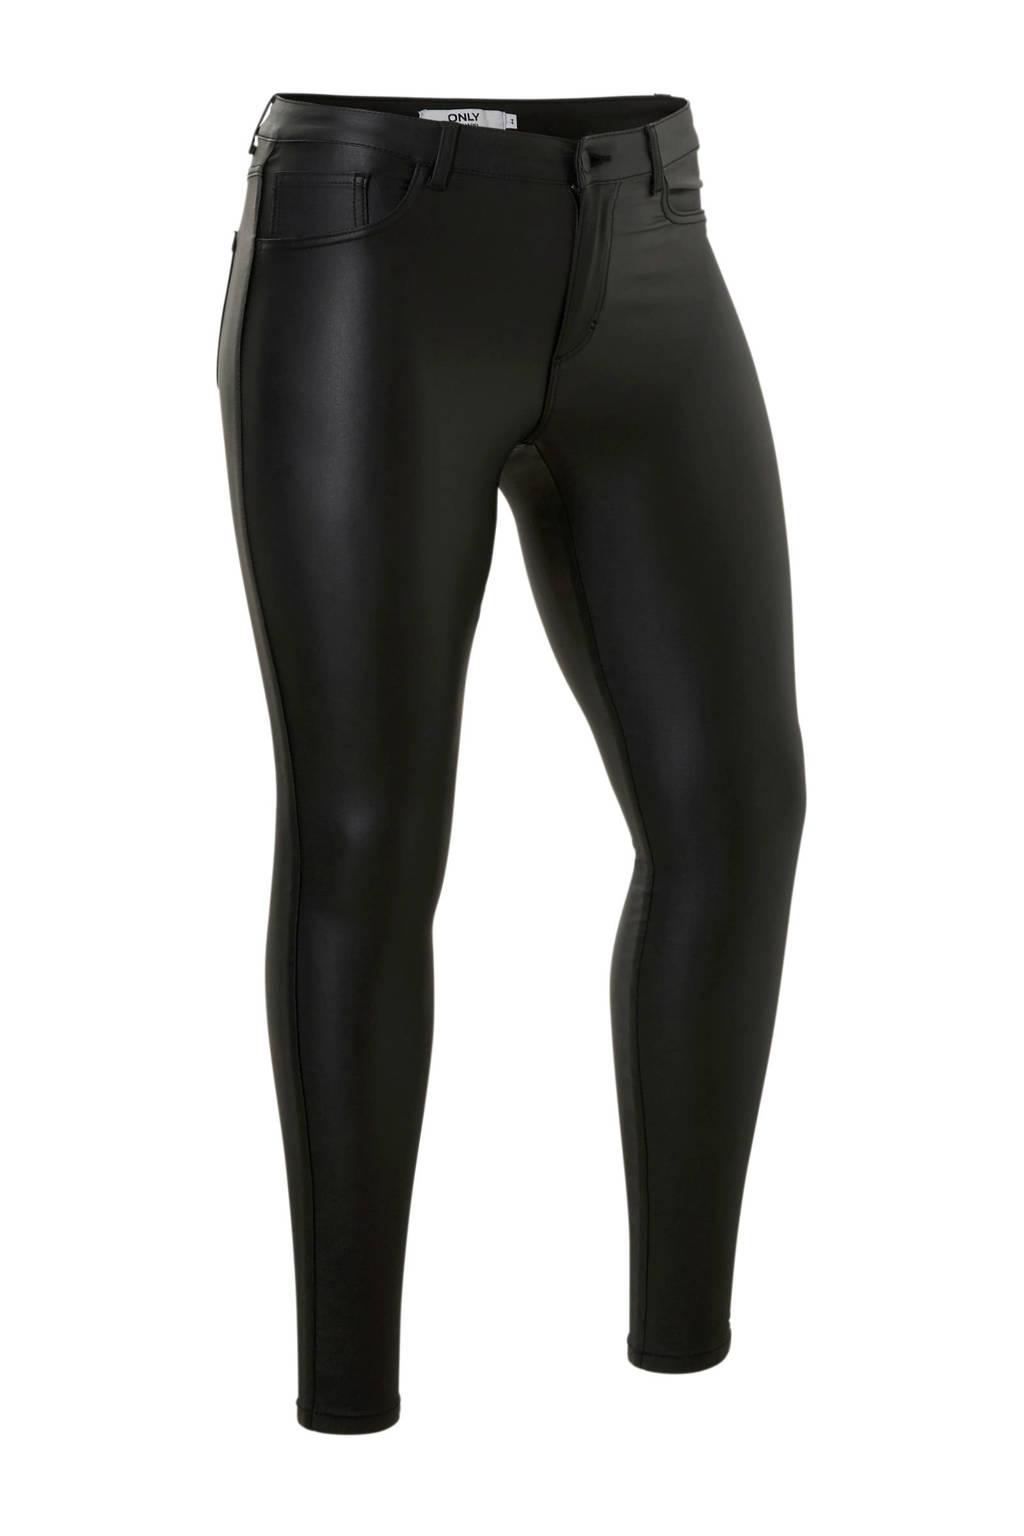 ONLY CARMAKOMA coated skinny jeans zwart, Zwart